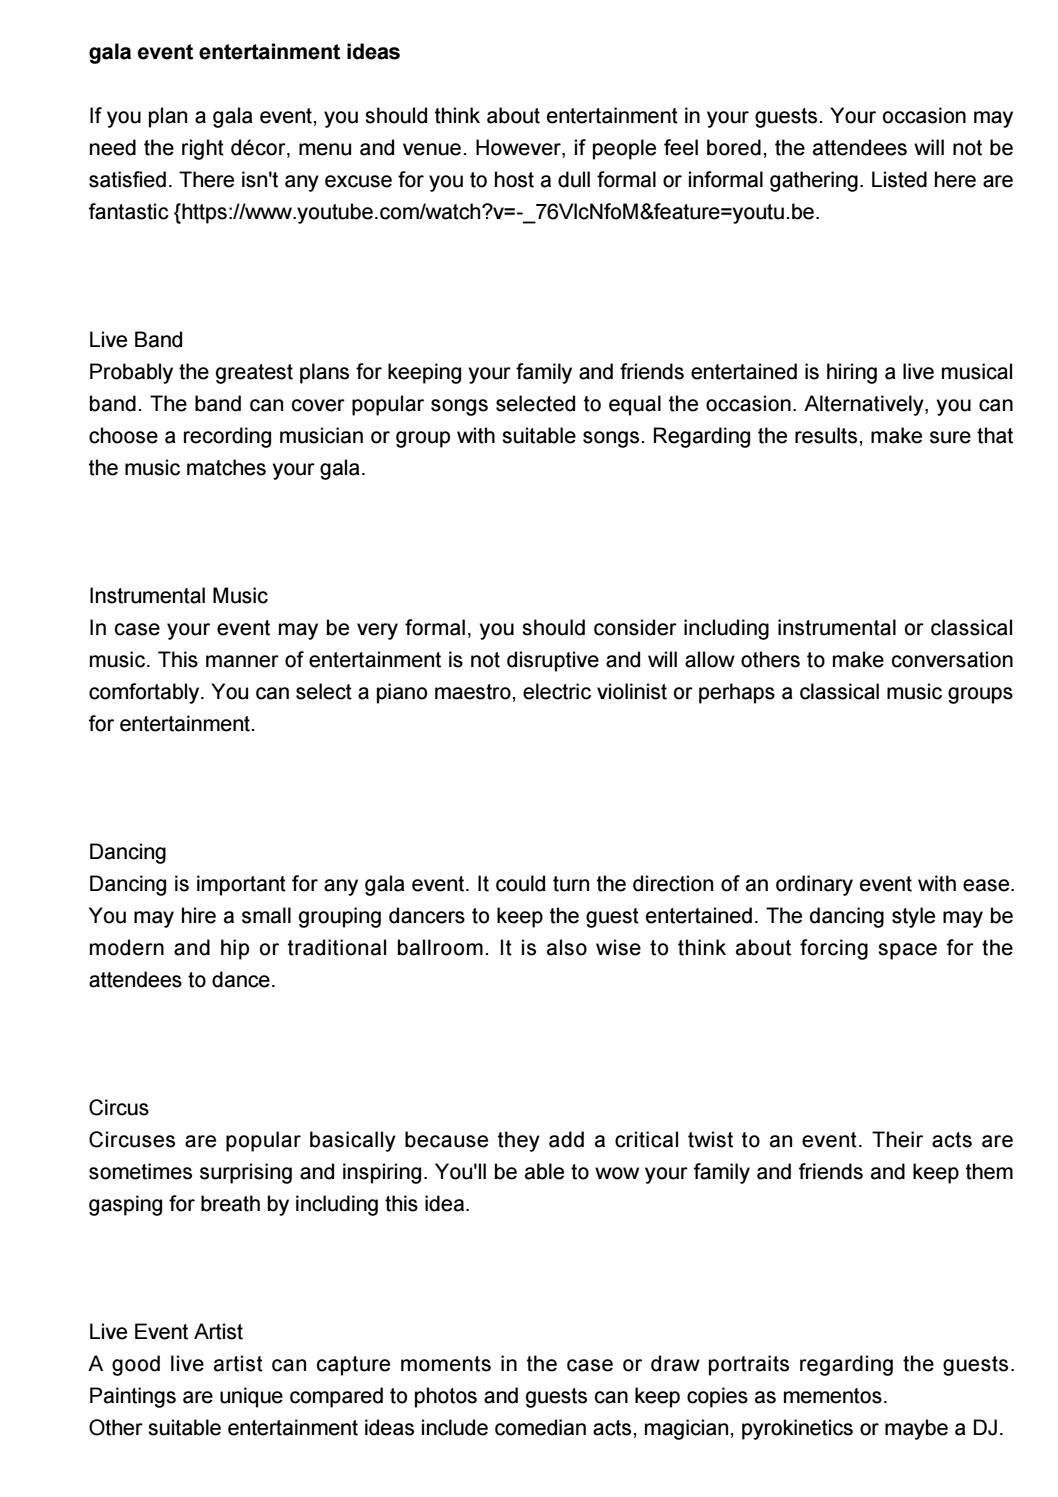 gala event entertainment ideas by galaeven61687ehei issuu